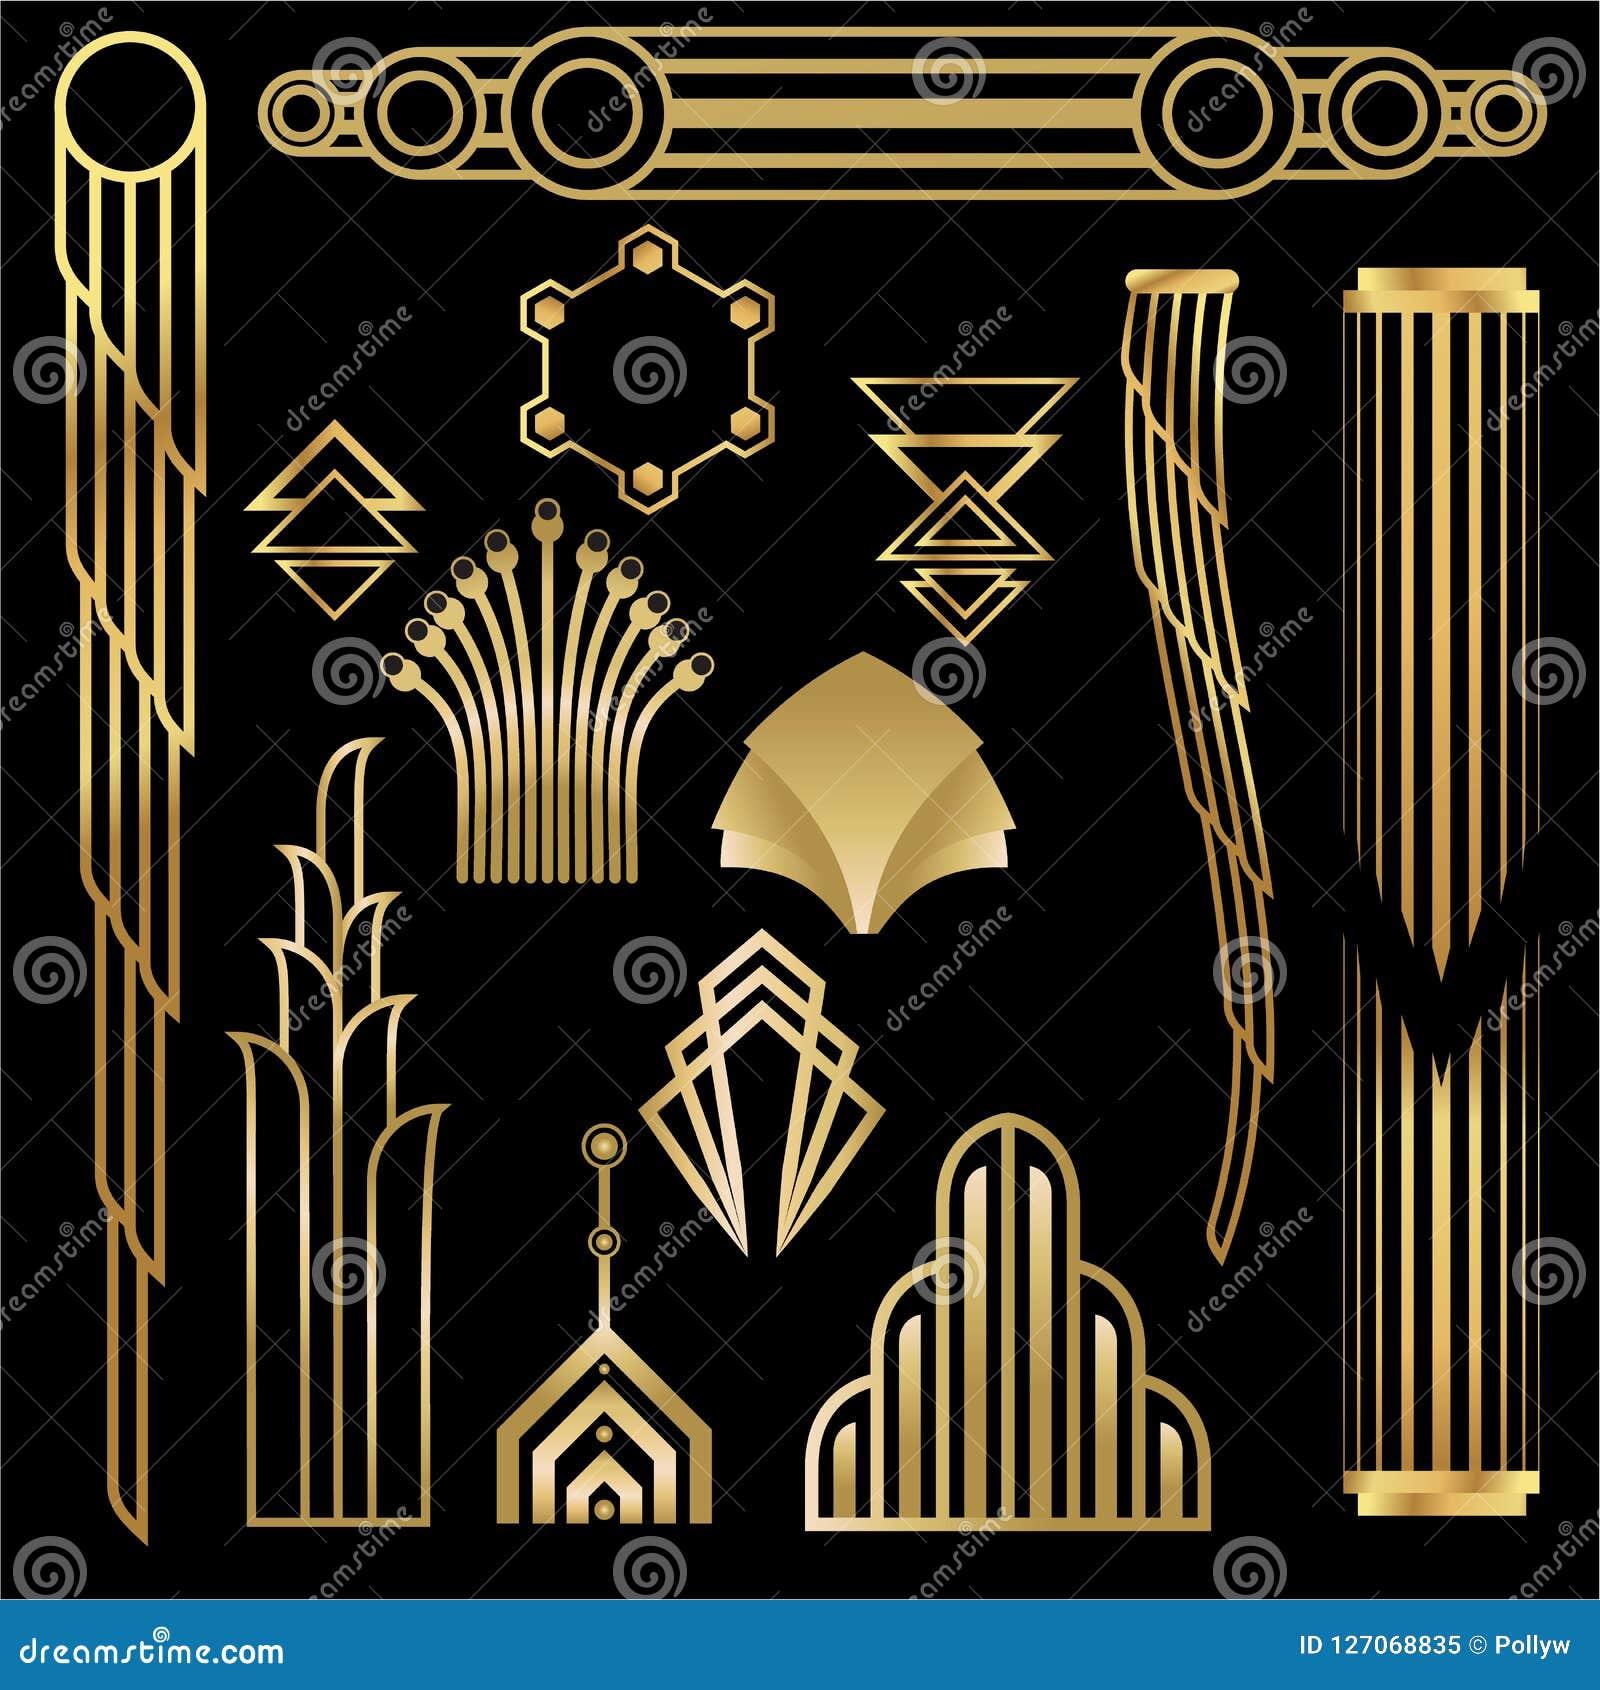 Art Deco Art Nuevo Geometric Elements Frames Triangles Circles